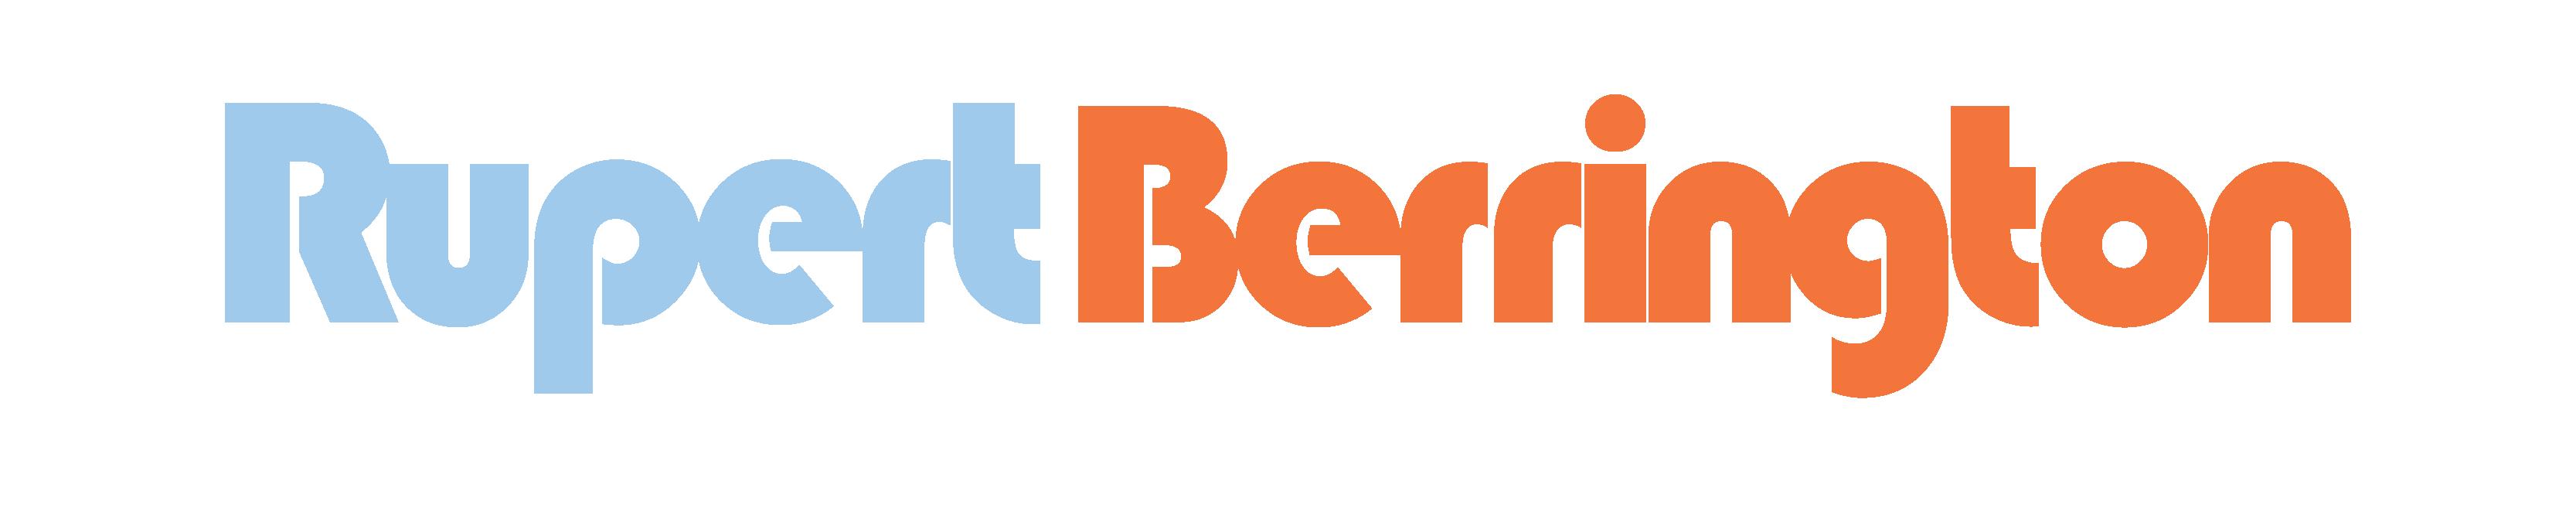 Rupert Berrington Action Photography